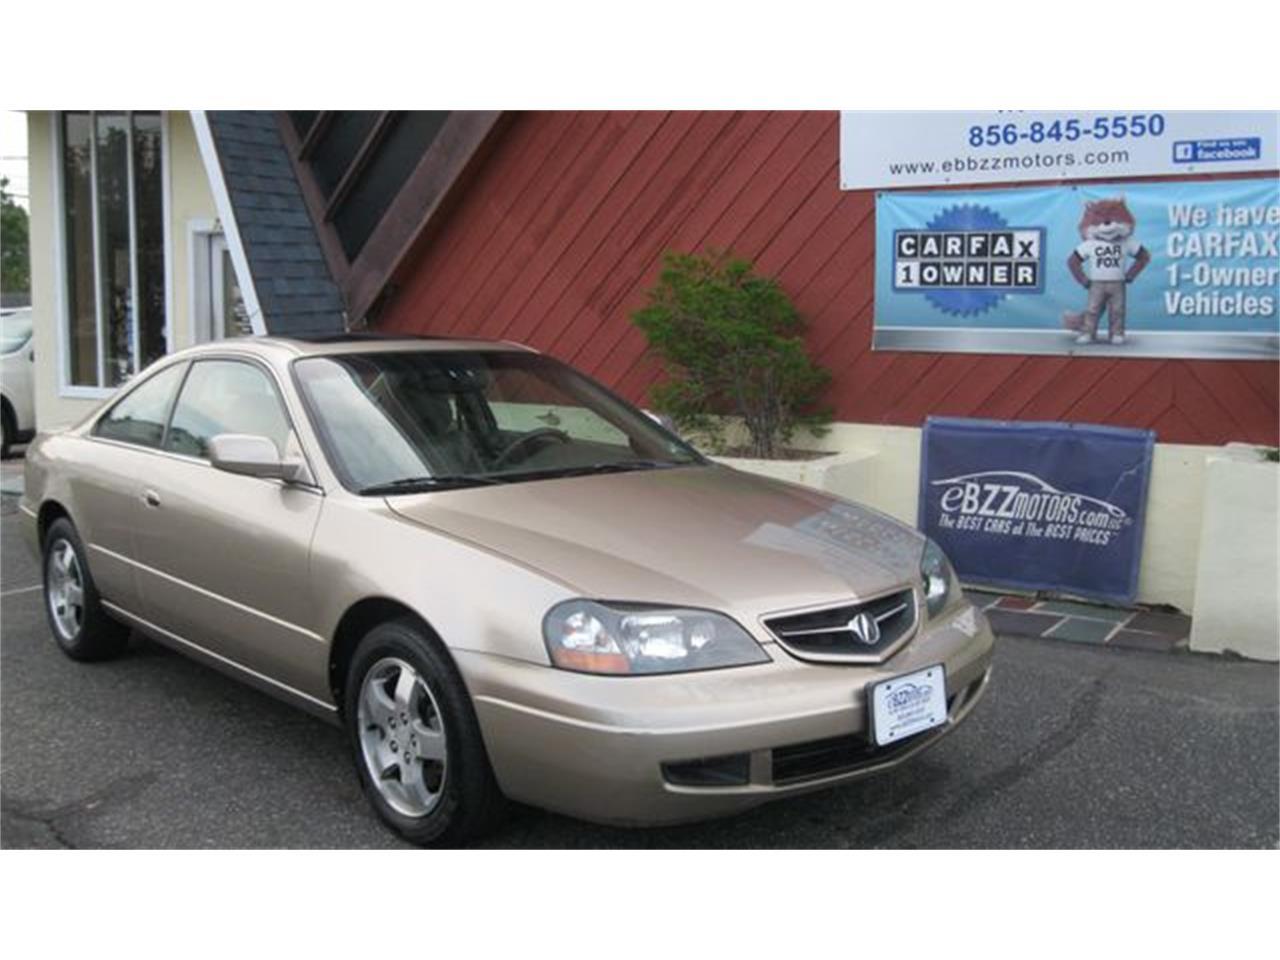 Acura CL For Sale ClassicCarscom CC - 2003 acura cl for sale